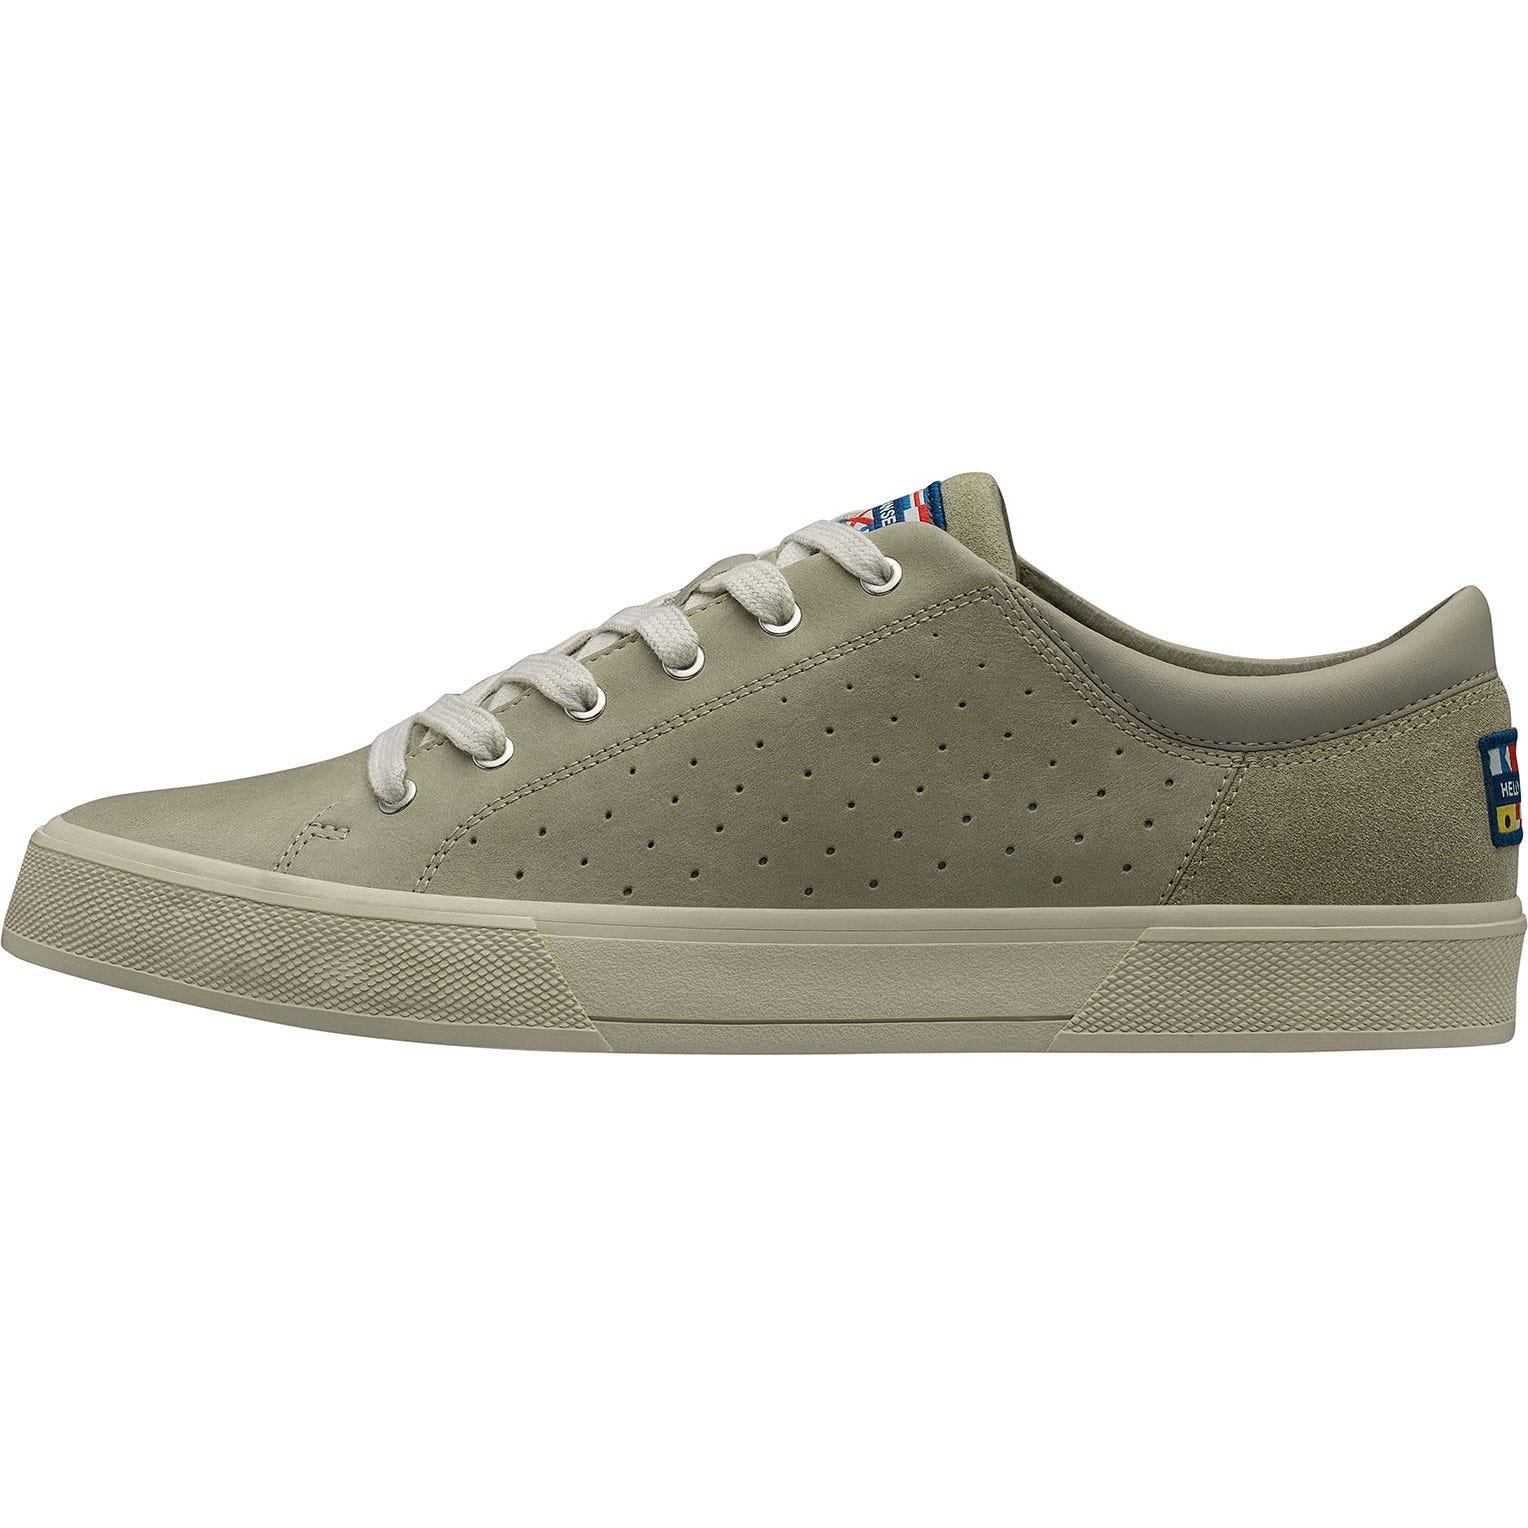 Helly Hansen Copenhagen Leather Shoe Mens Casual Grey 46.5/12